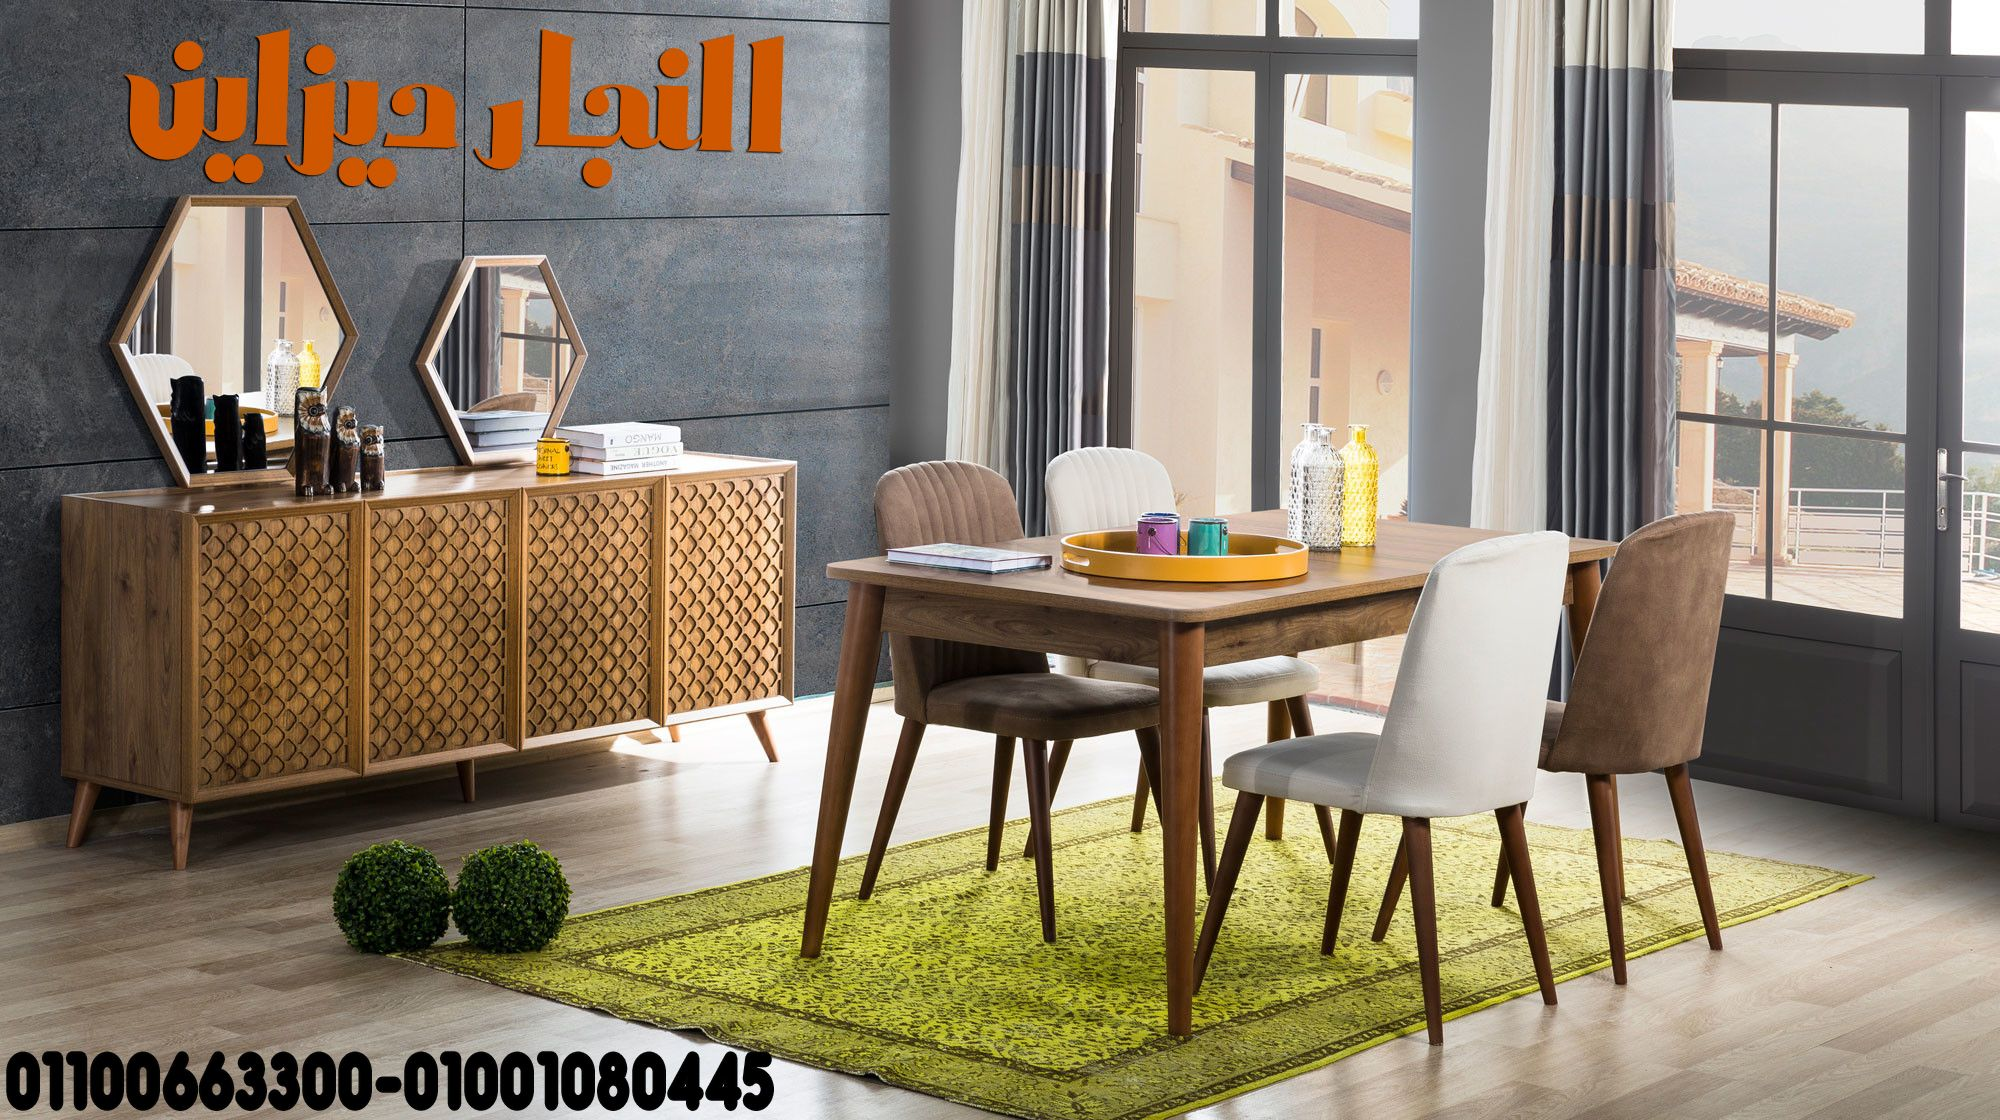 احدث صور موديلات غرف سفرة مودرن 2022النجار ديزاين Furniture Design Living Room Home Decor Furniture